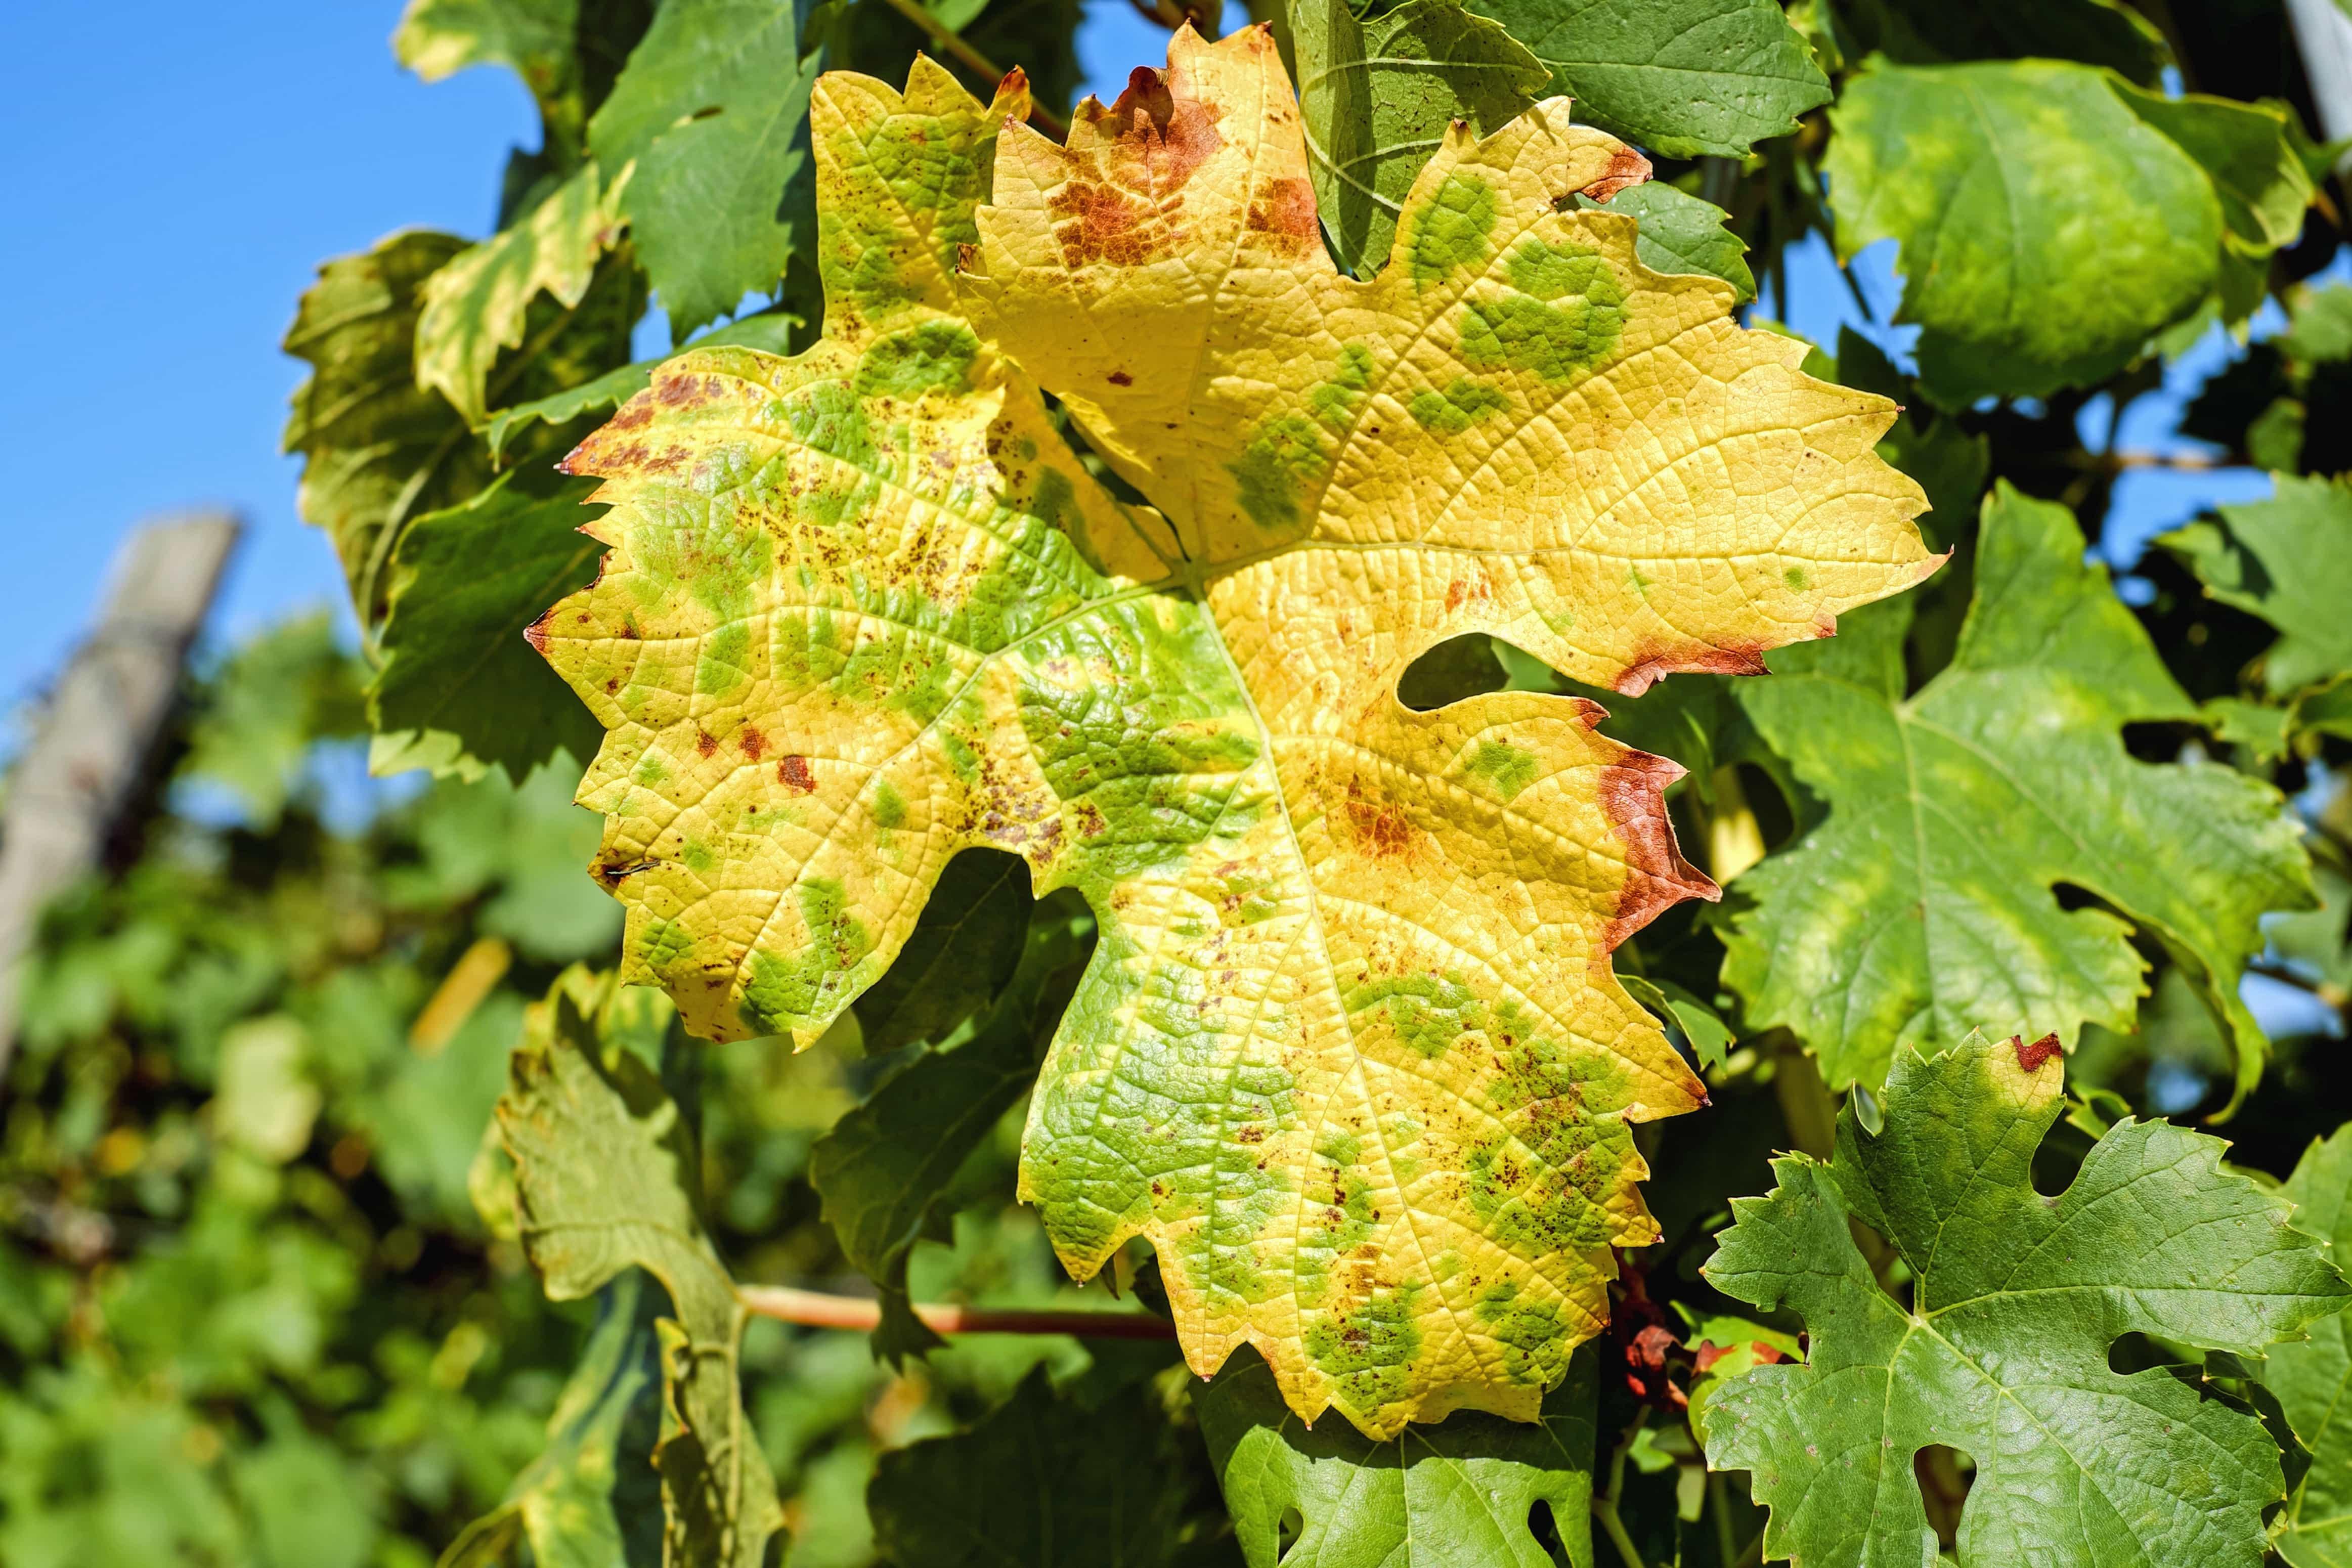 Fabelhaft Kostenlose Bild: Landwirtschaft, Obst, Pflanzen, Baum, Blatt @VT_61